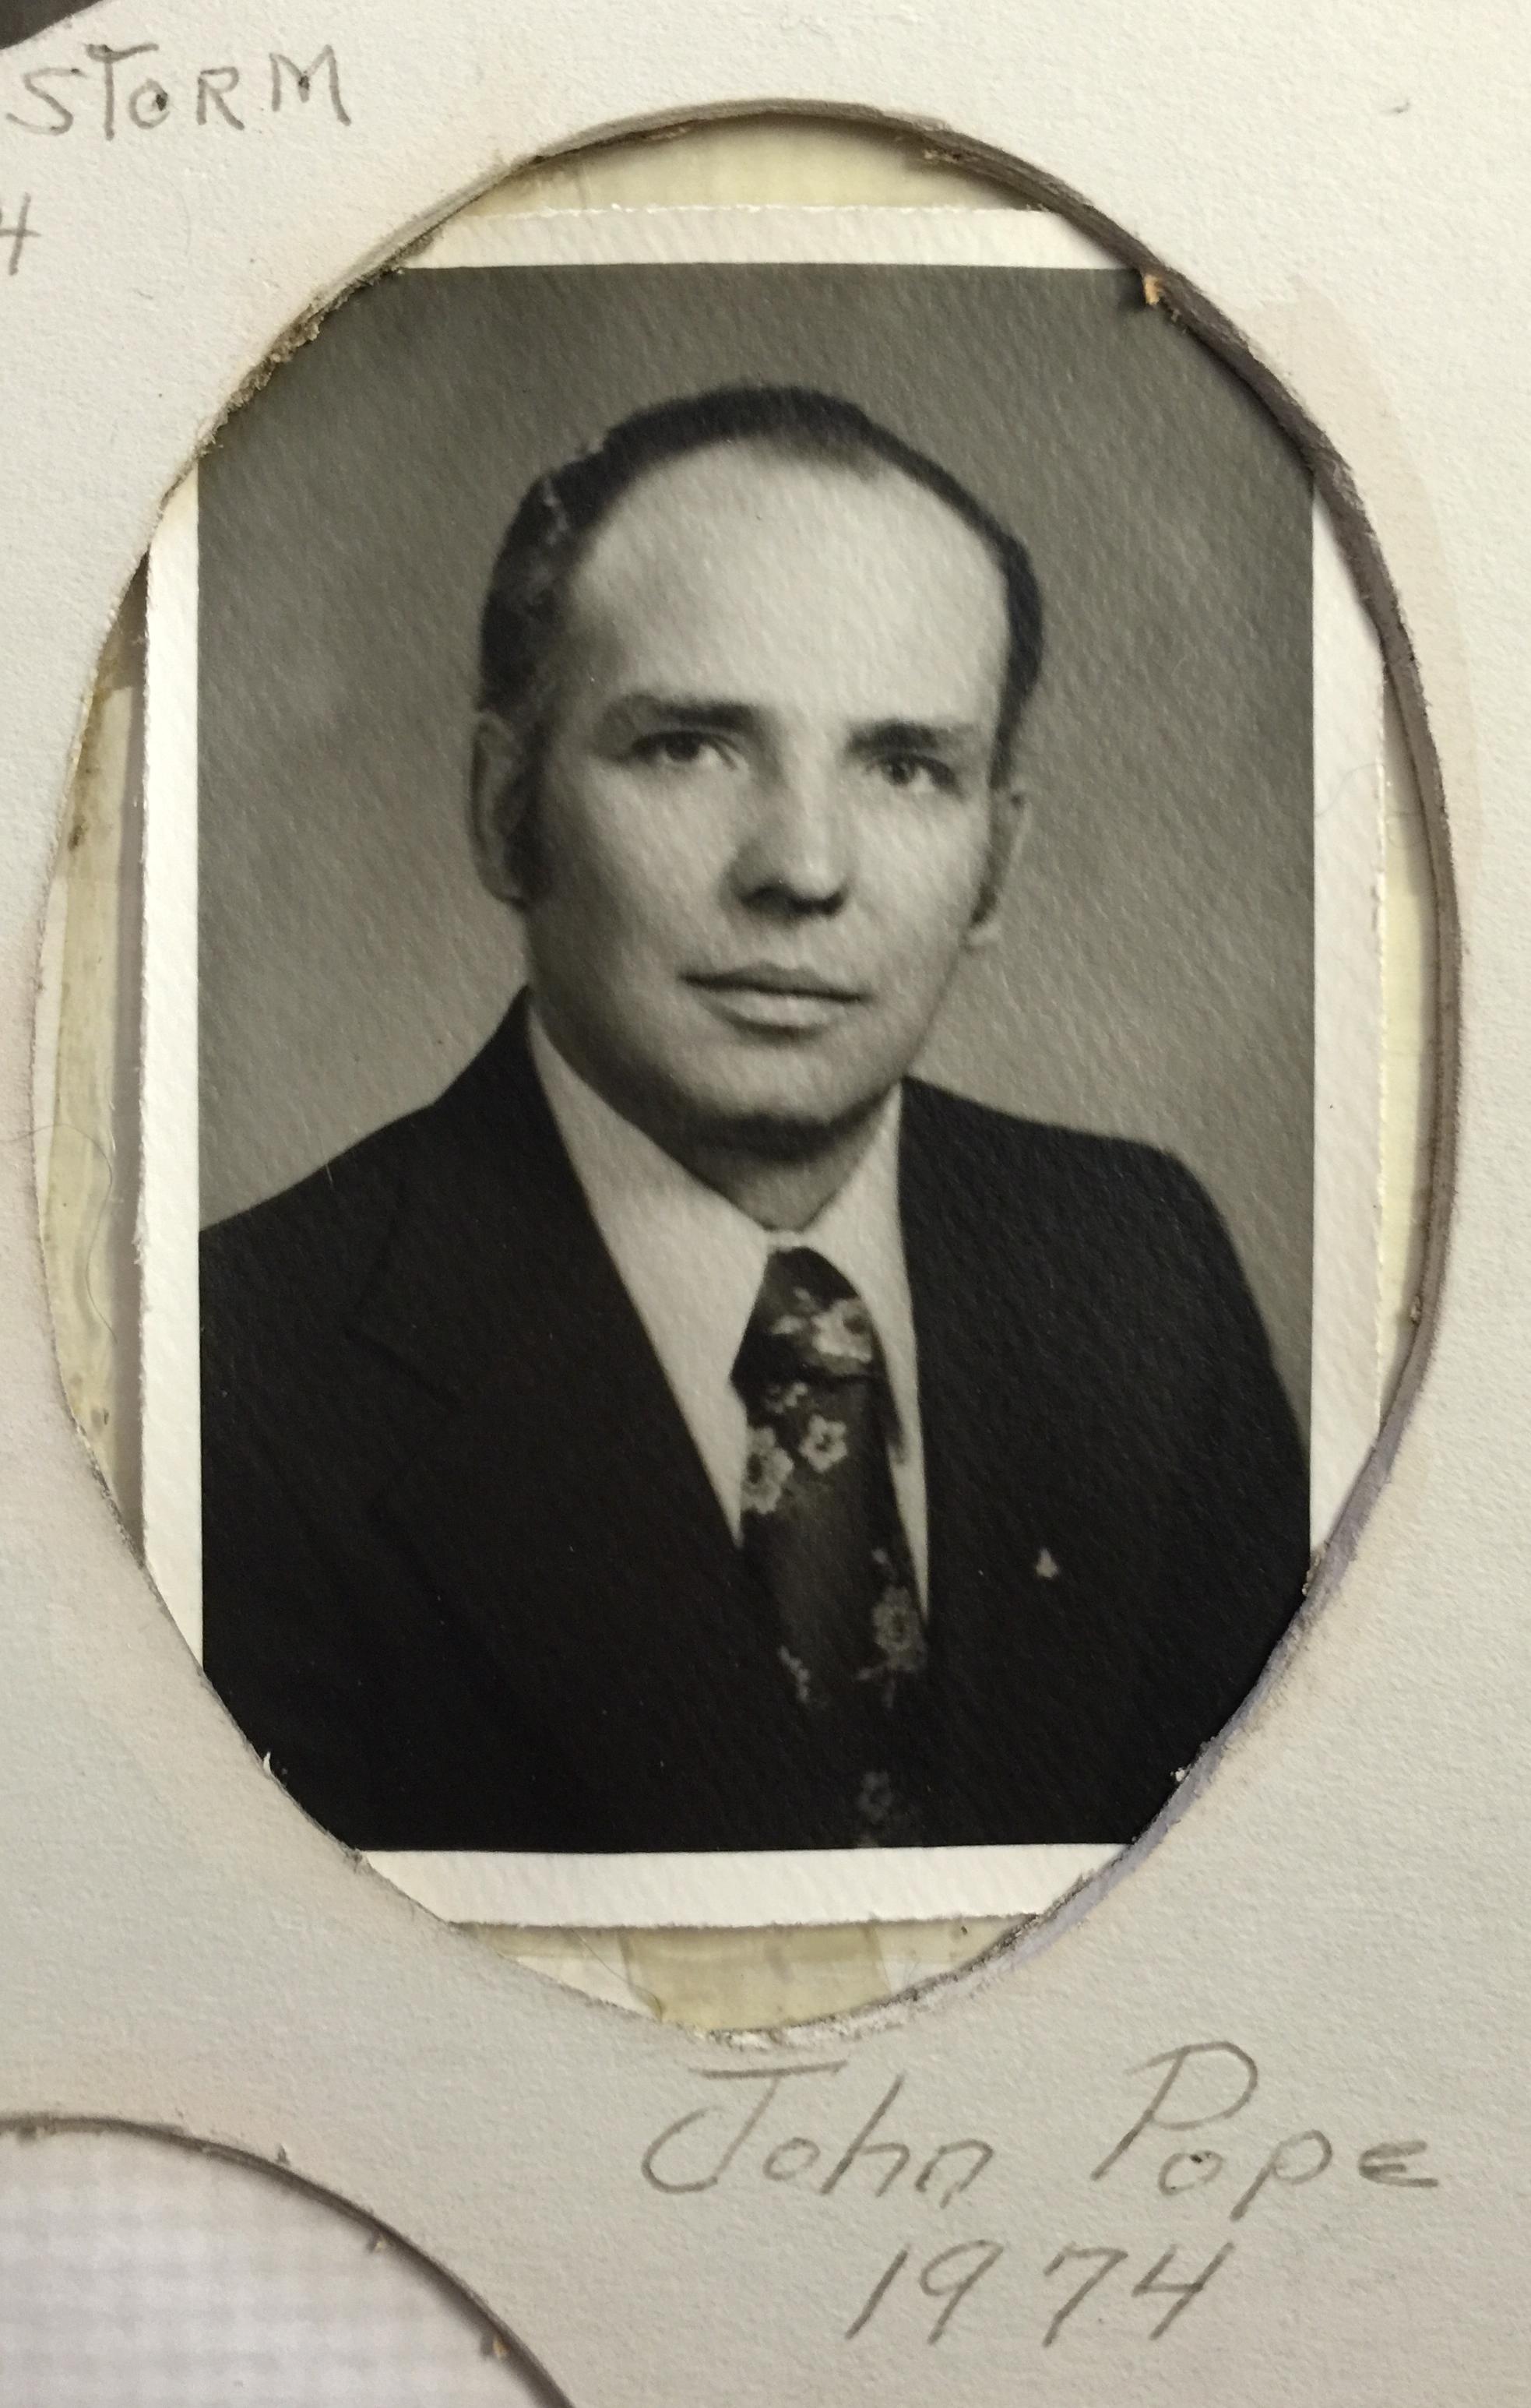 1974 John Pope